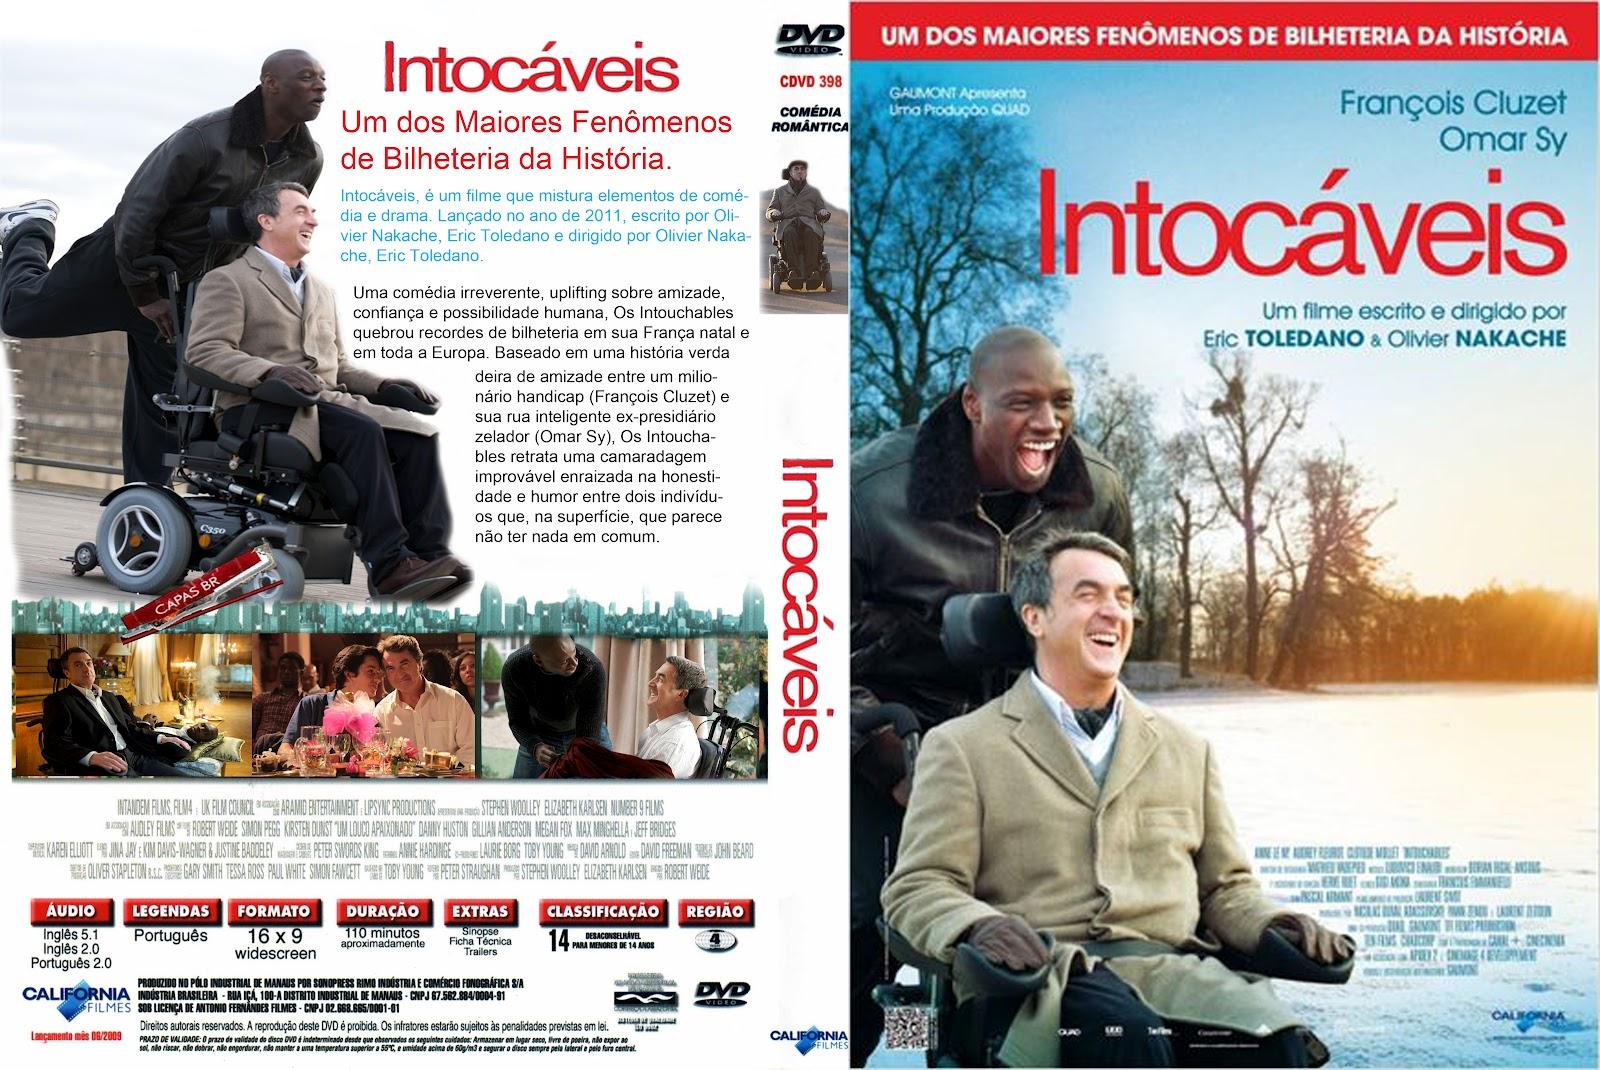 intocc3a1veis-2012_capa01